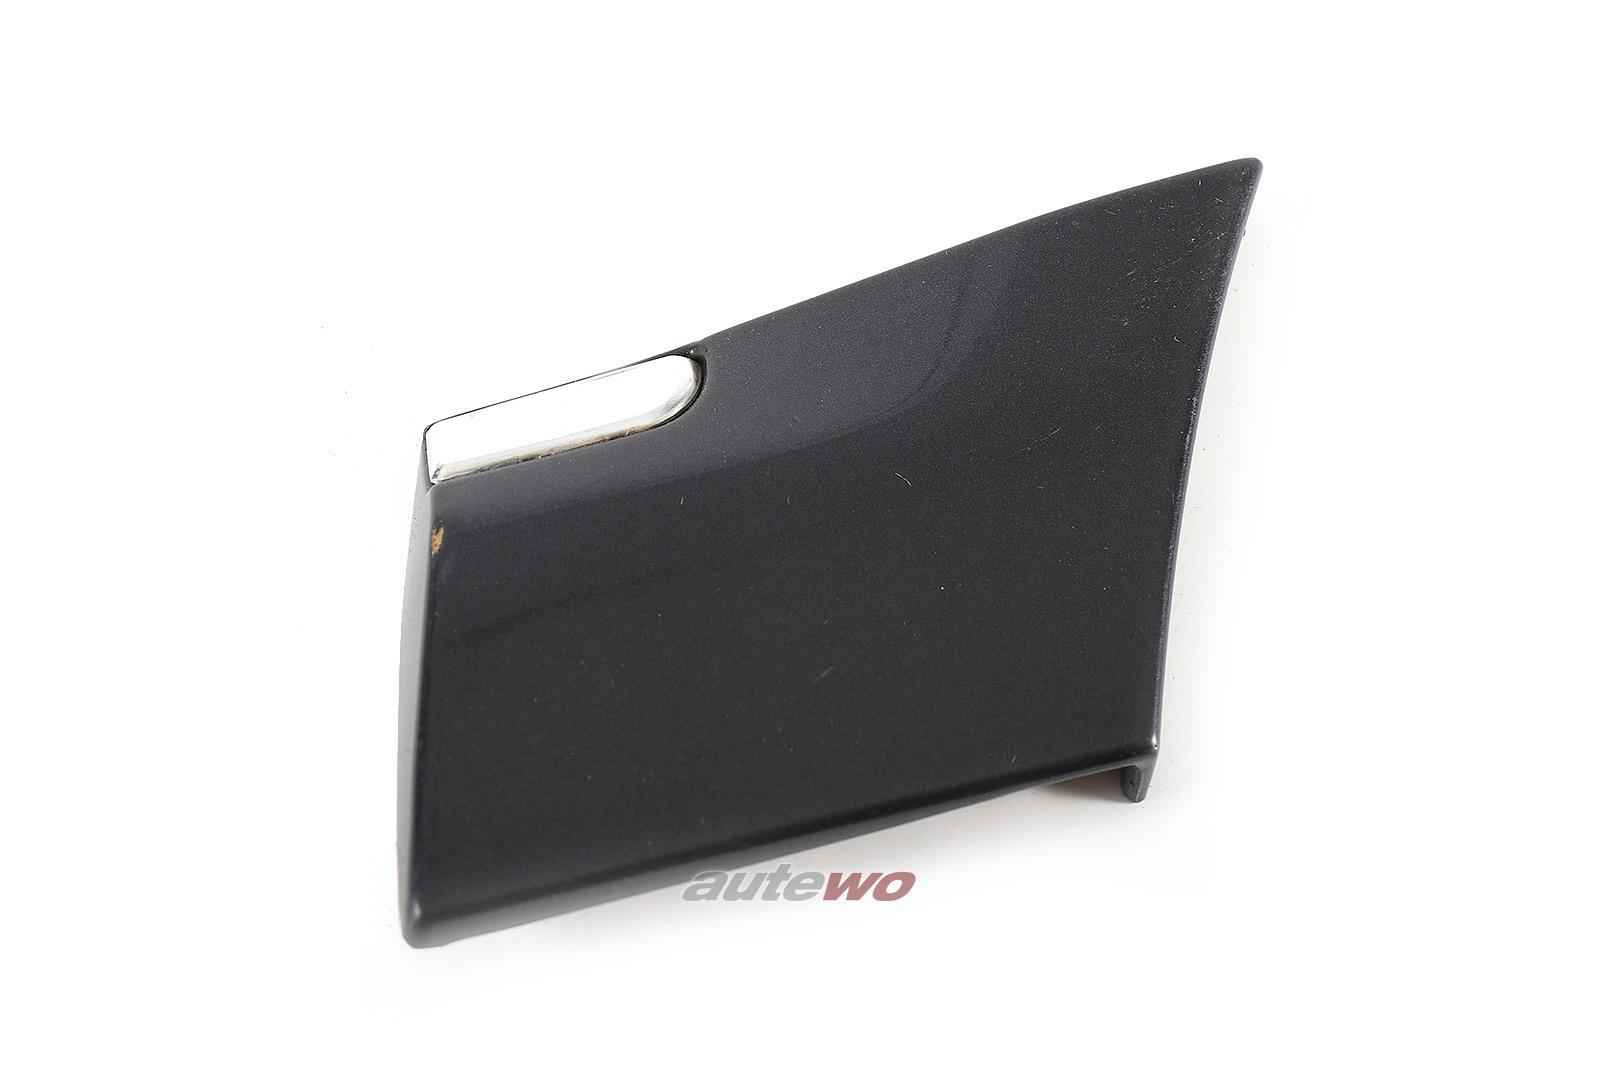 4D0853983 Audi A8/S8 D2 Schutzleiste für Seitenteil Hinten Links